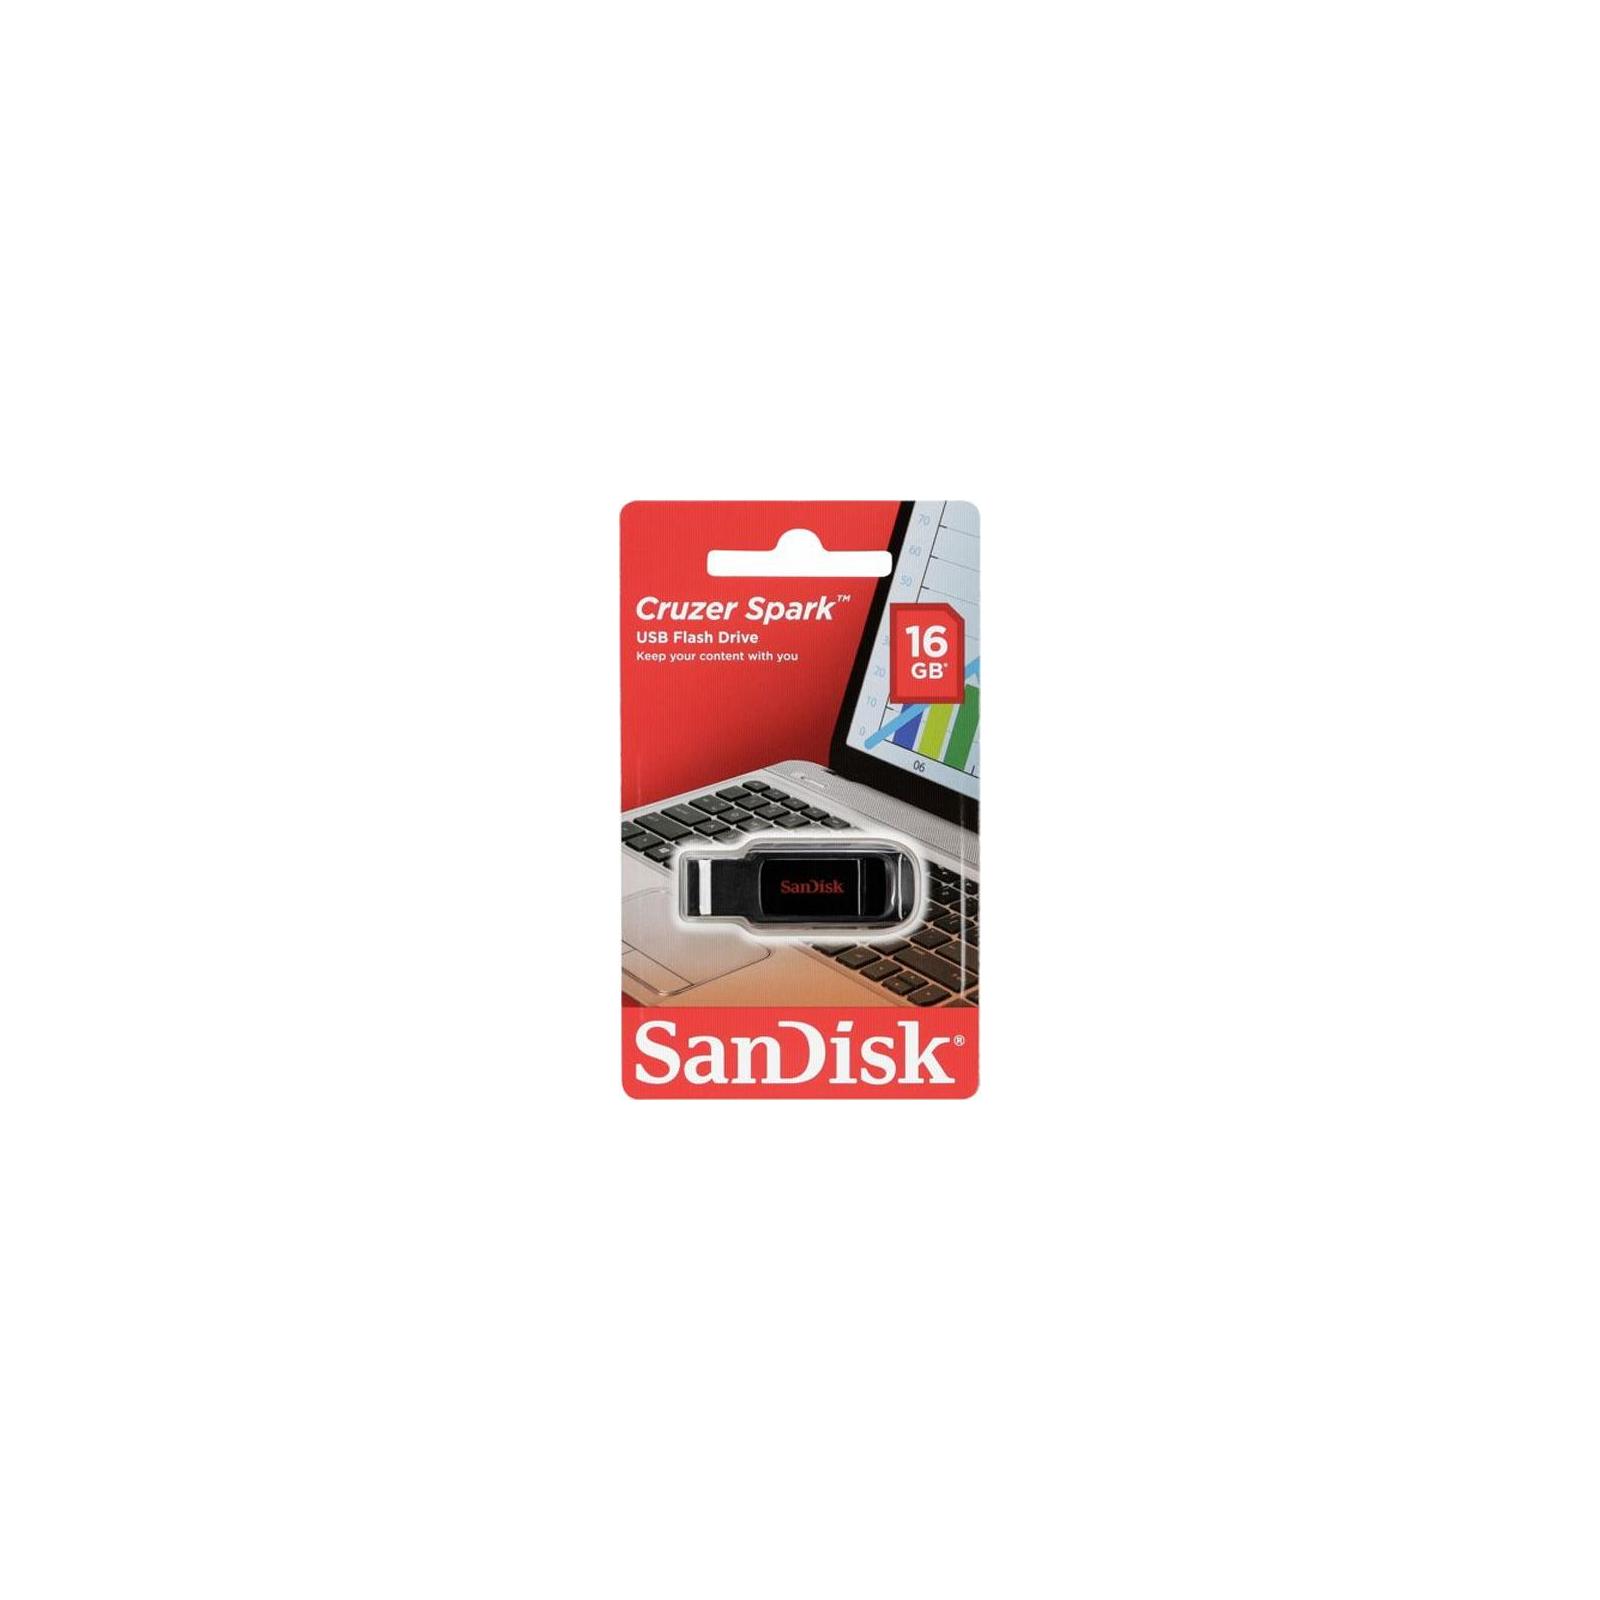 USB флеш накопитель SanDisk 16GB Cruzer Spark USB 2.0 (SDCZ61-016G-G35) изображение 7